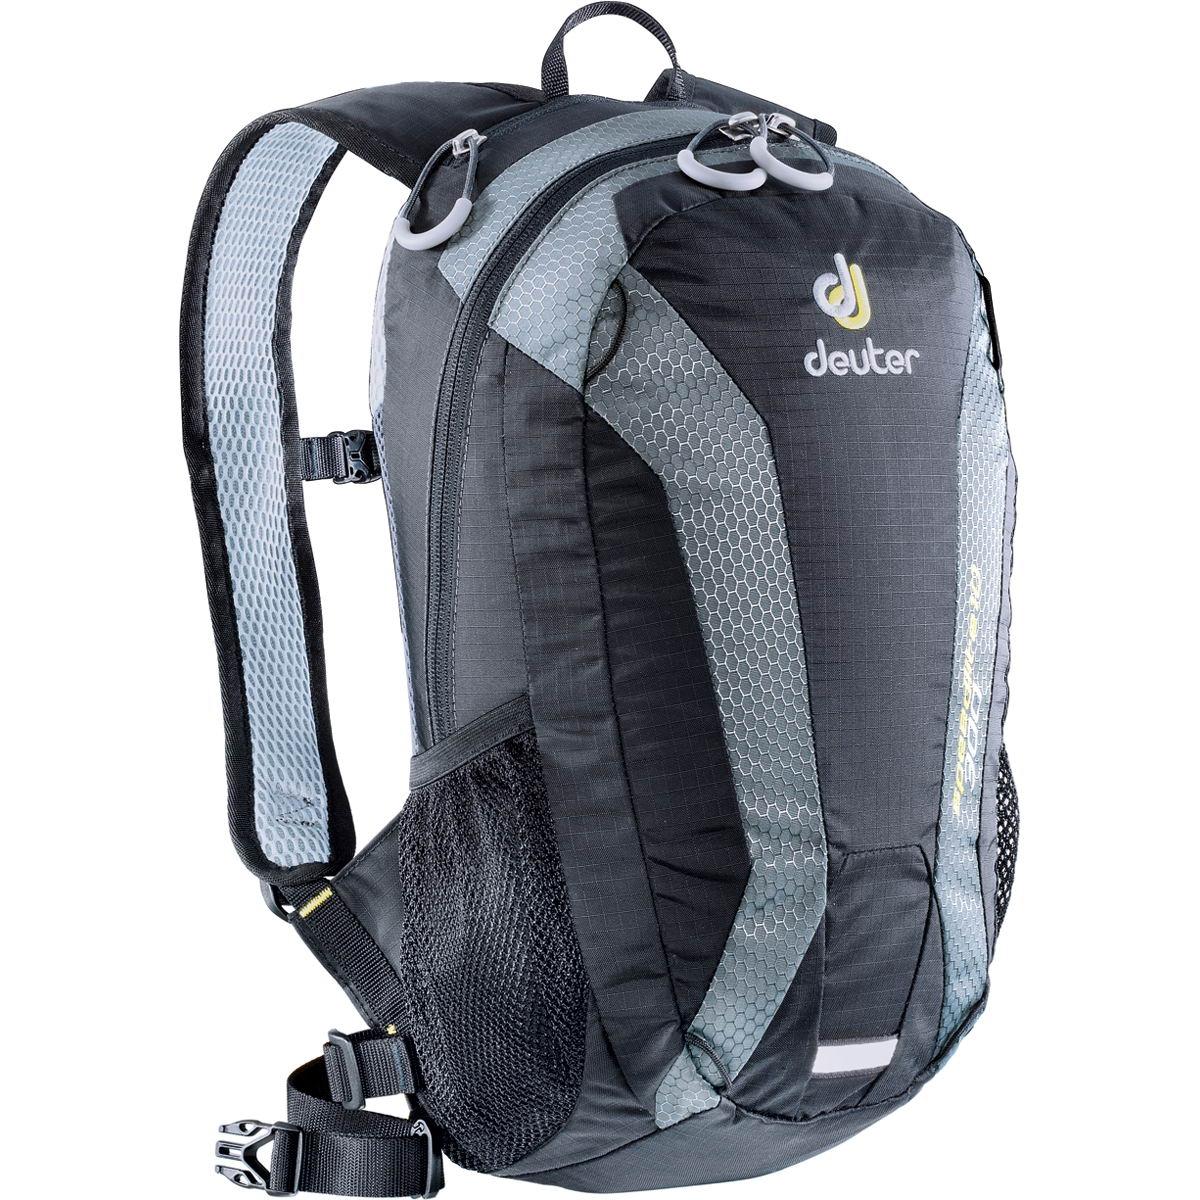 Horolezecký batoh DEUTER Speed Lite 10 2016 černo-šedá